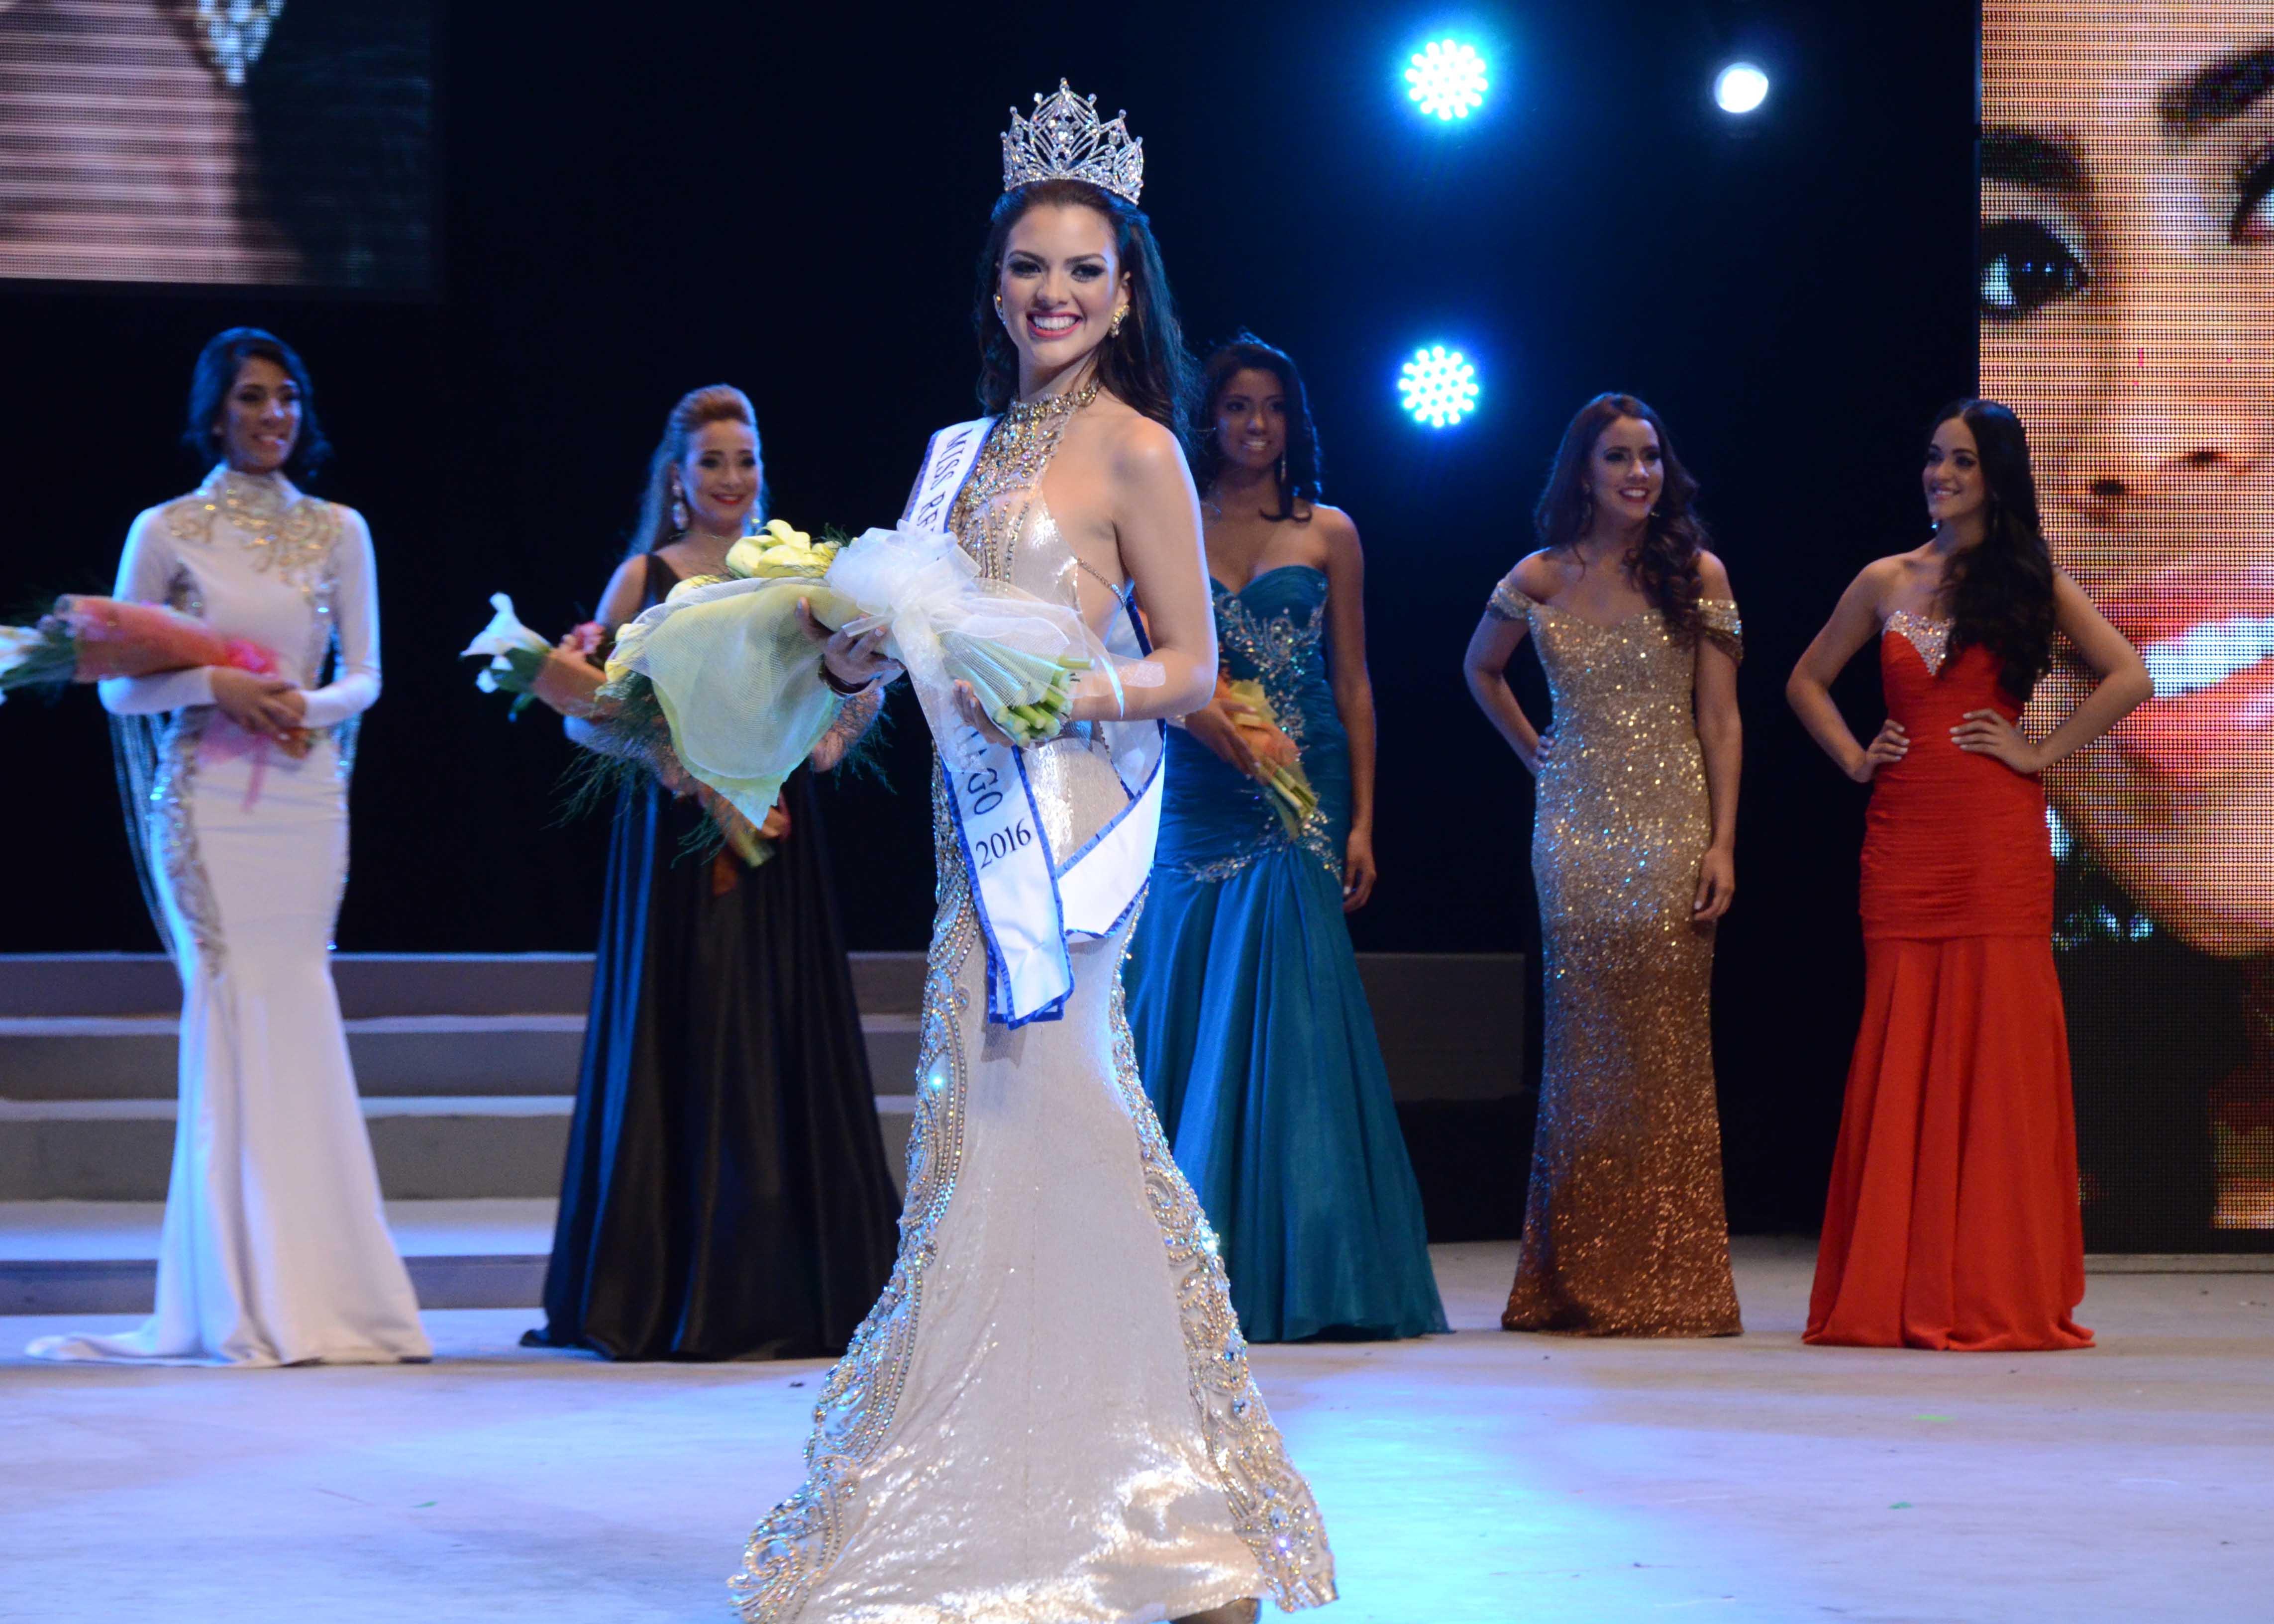 Katherine Camacho, Miss RD Santiago 2016.